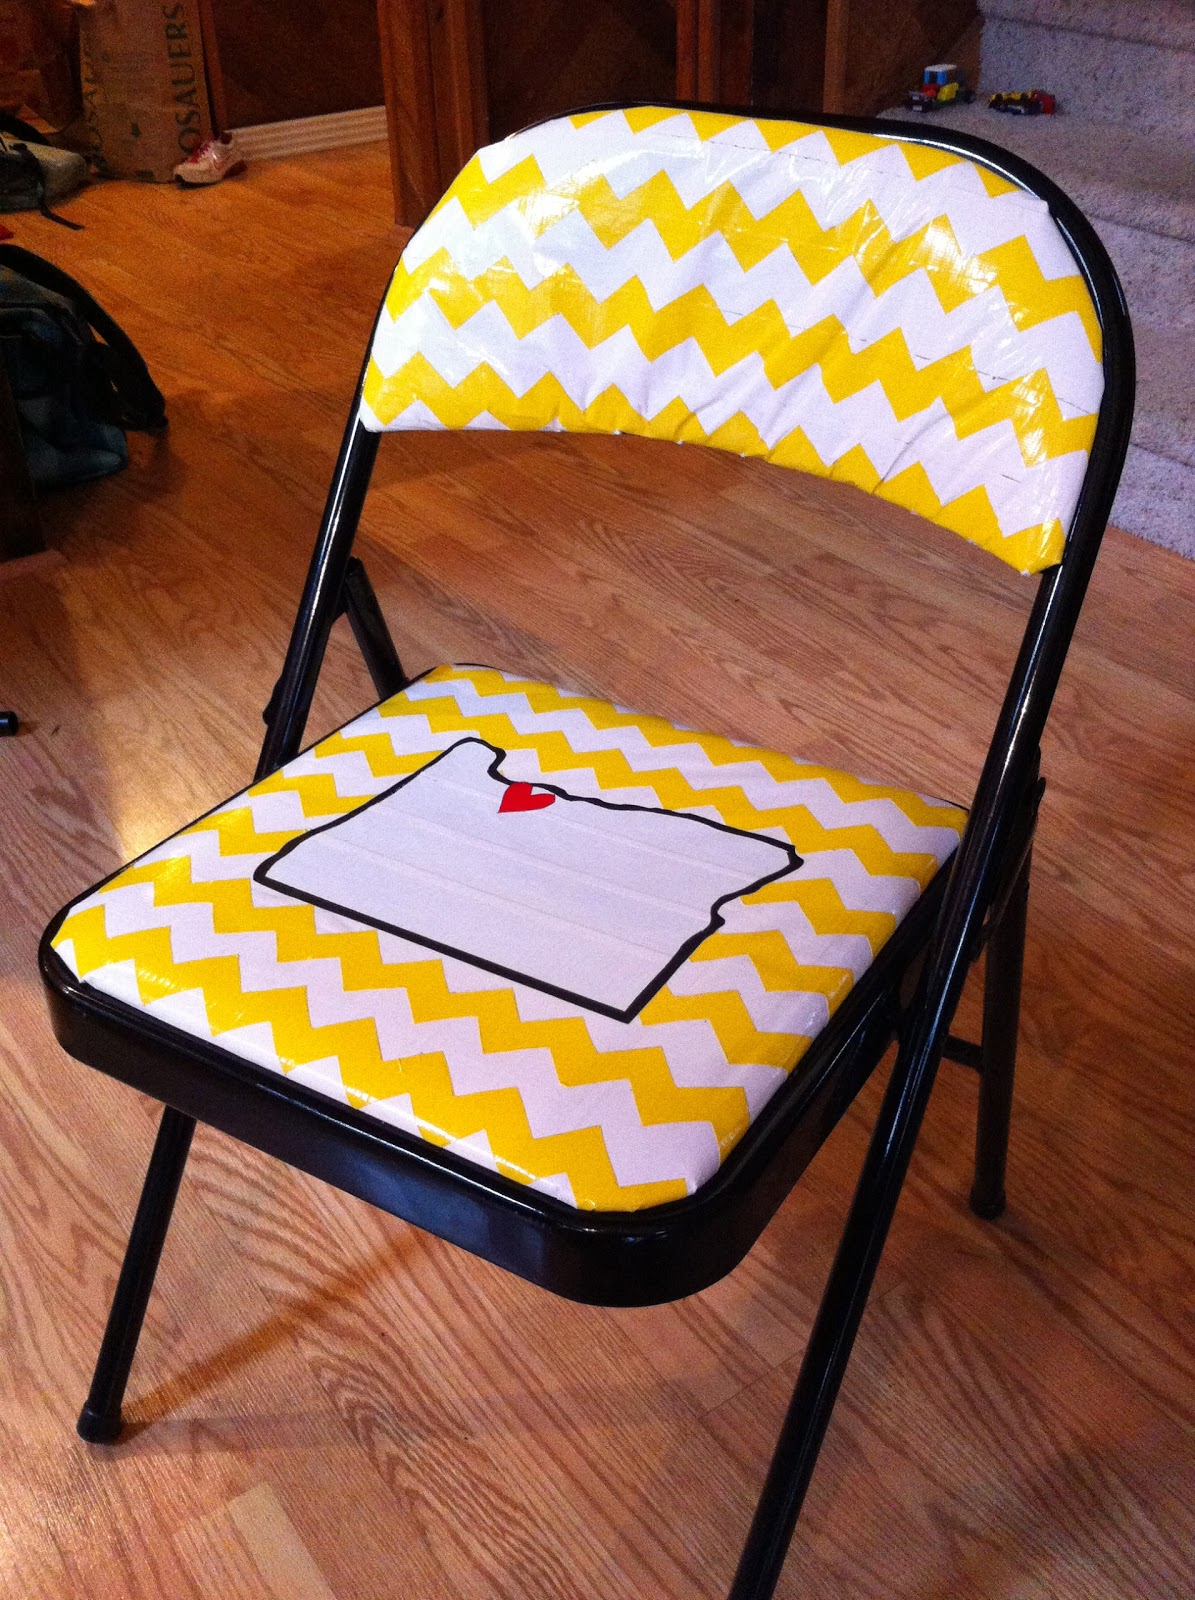 a chair affair covers bristol and bath rethink crafts